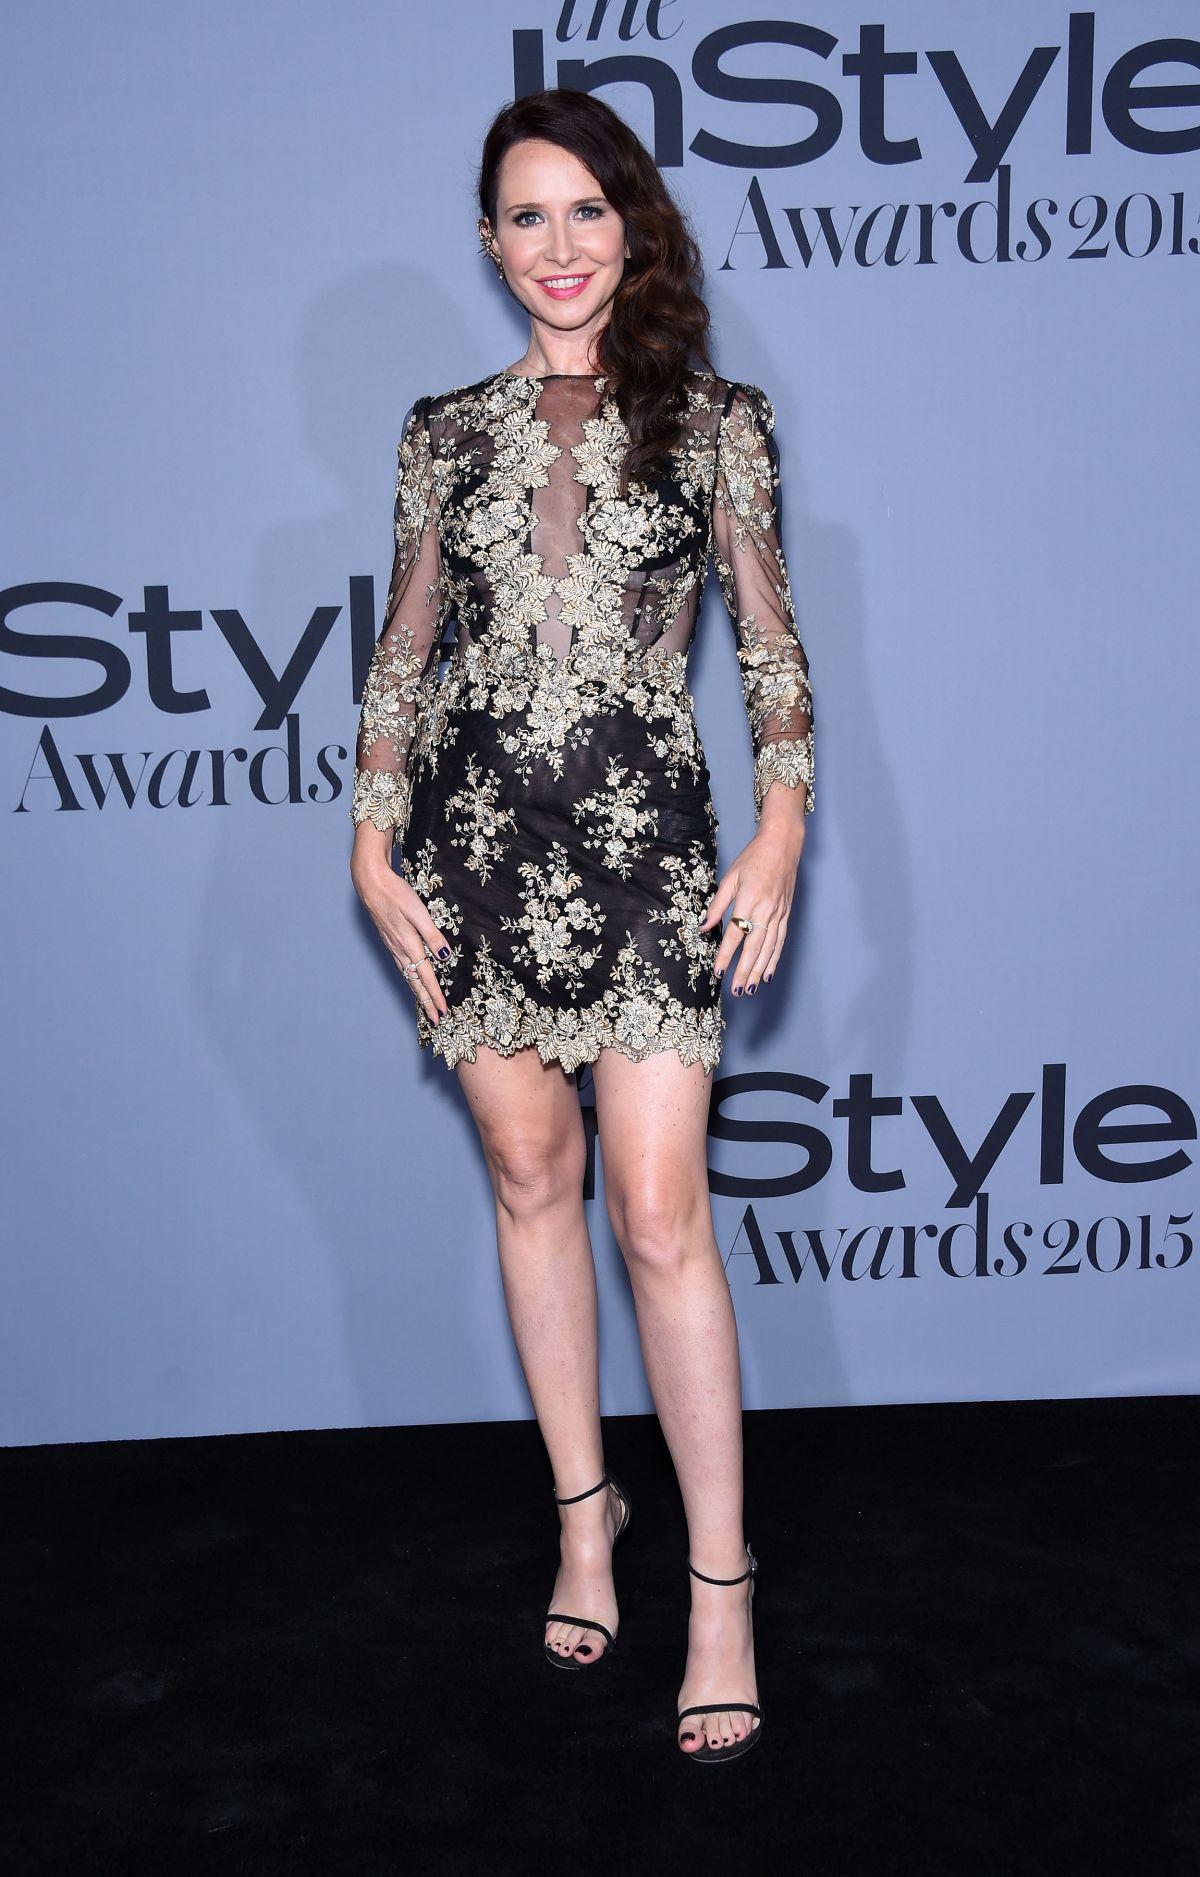 KATHERINE JANE BRYANT at InStyle Awards 2015 in Los Angeles 10/26/2015